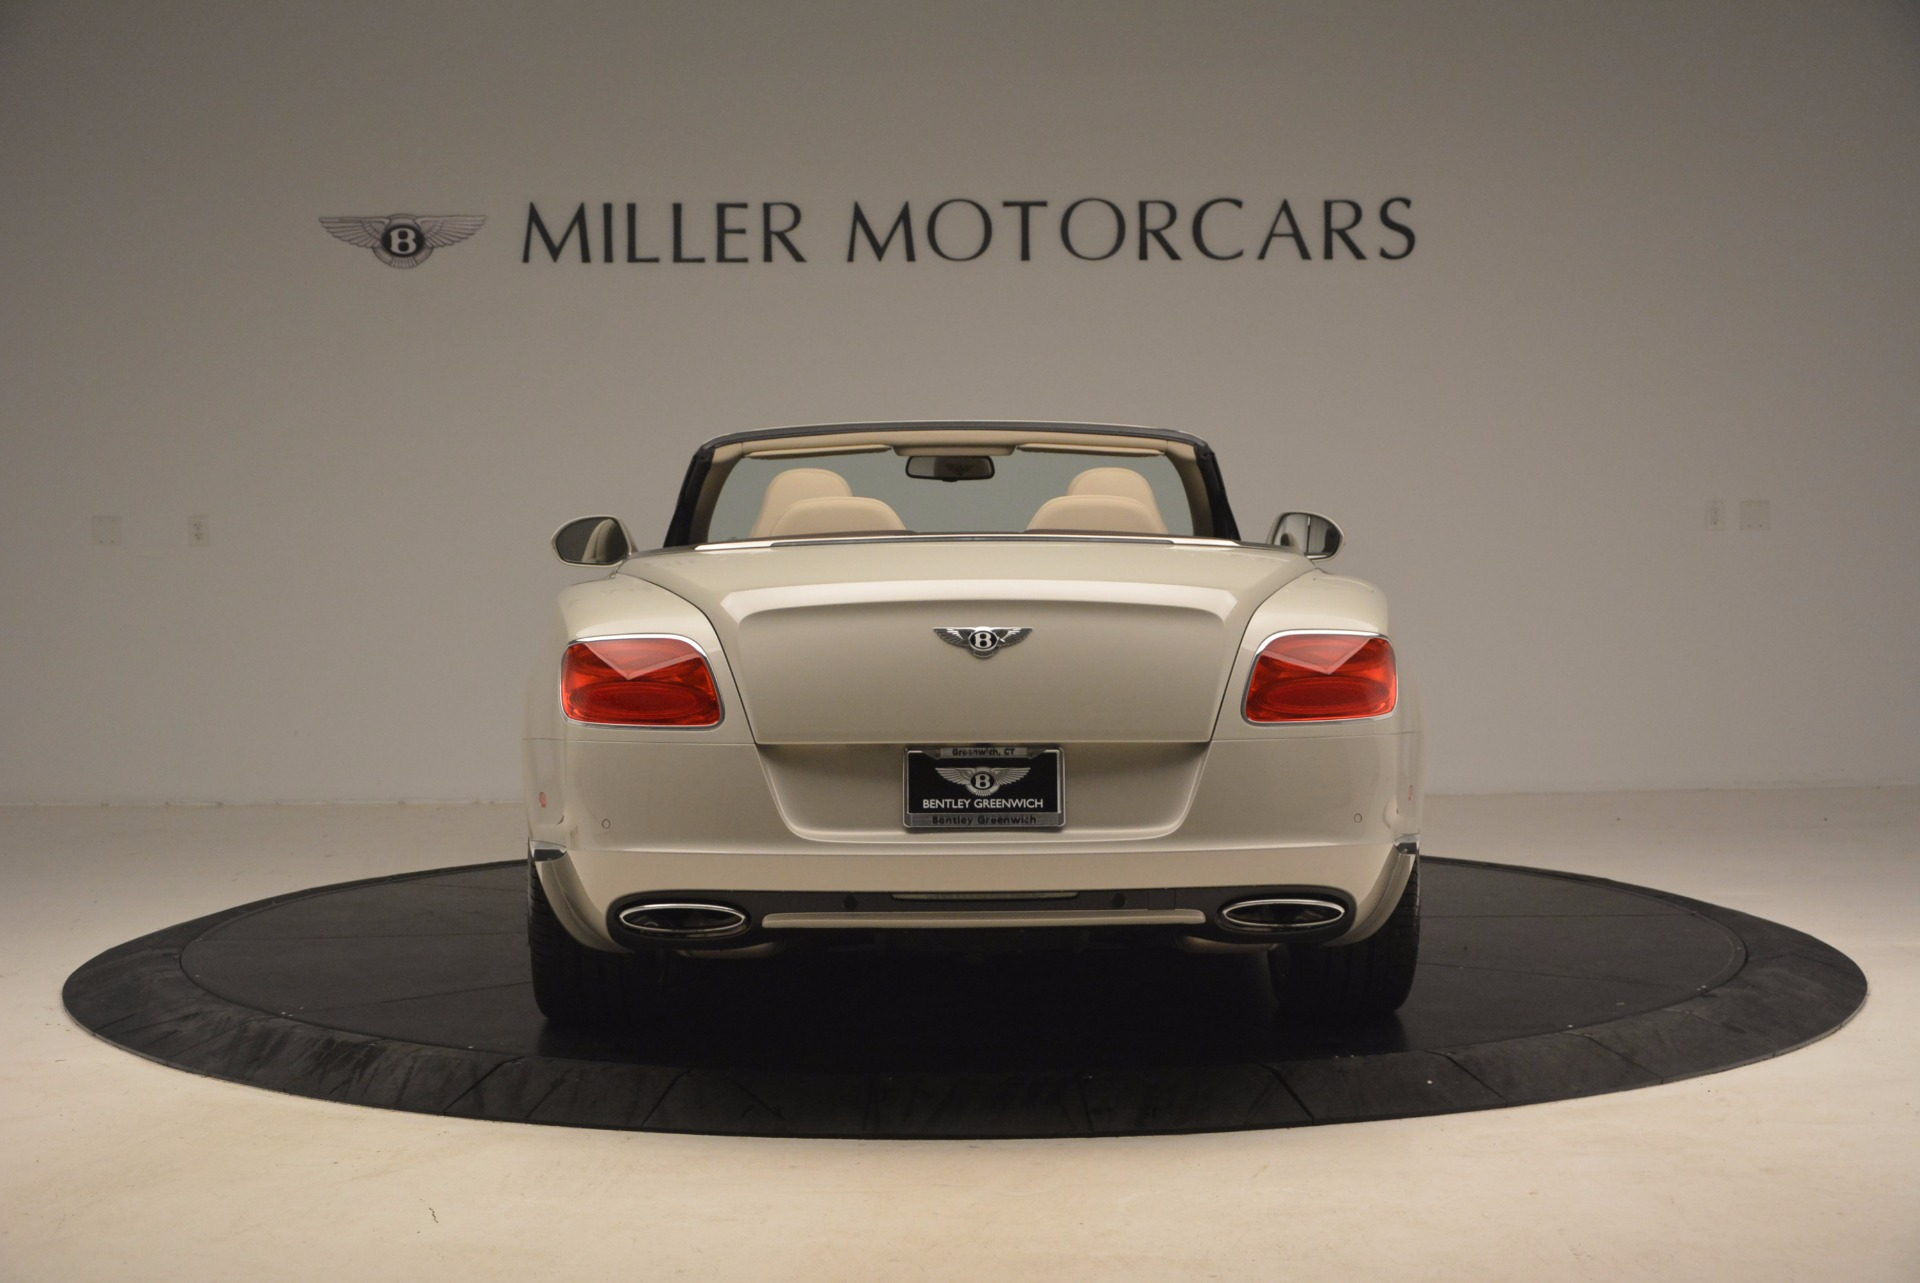 Used 2013 Bentley Continental GT  For Sale In Westport, CT 1172_p6